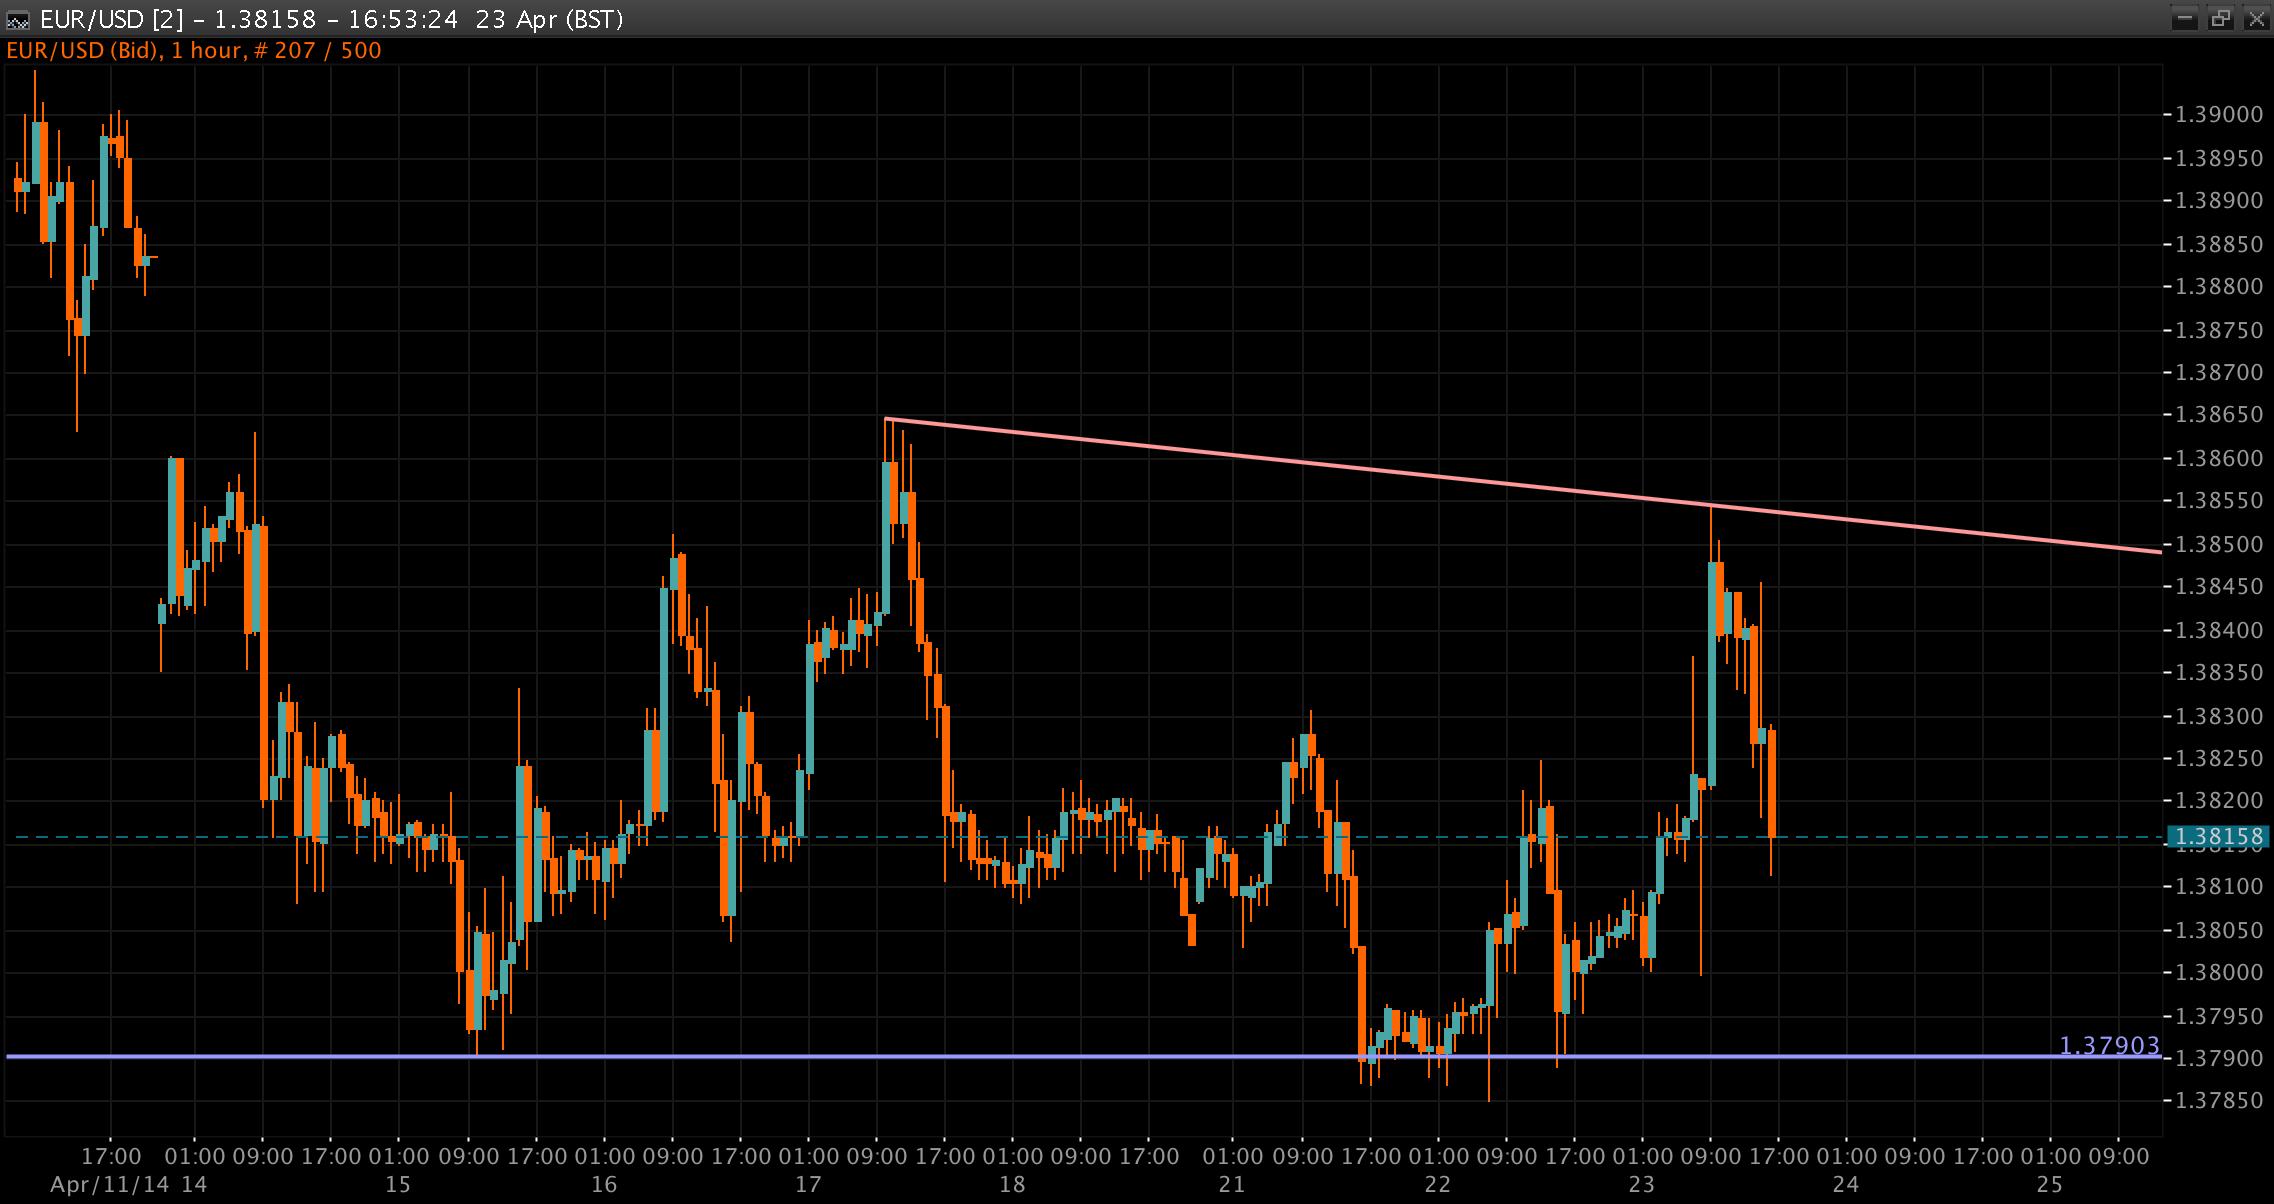 EUR/USD Chart 22 Apr 2014